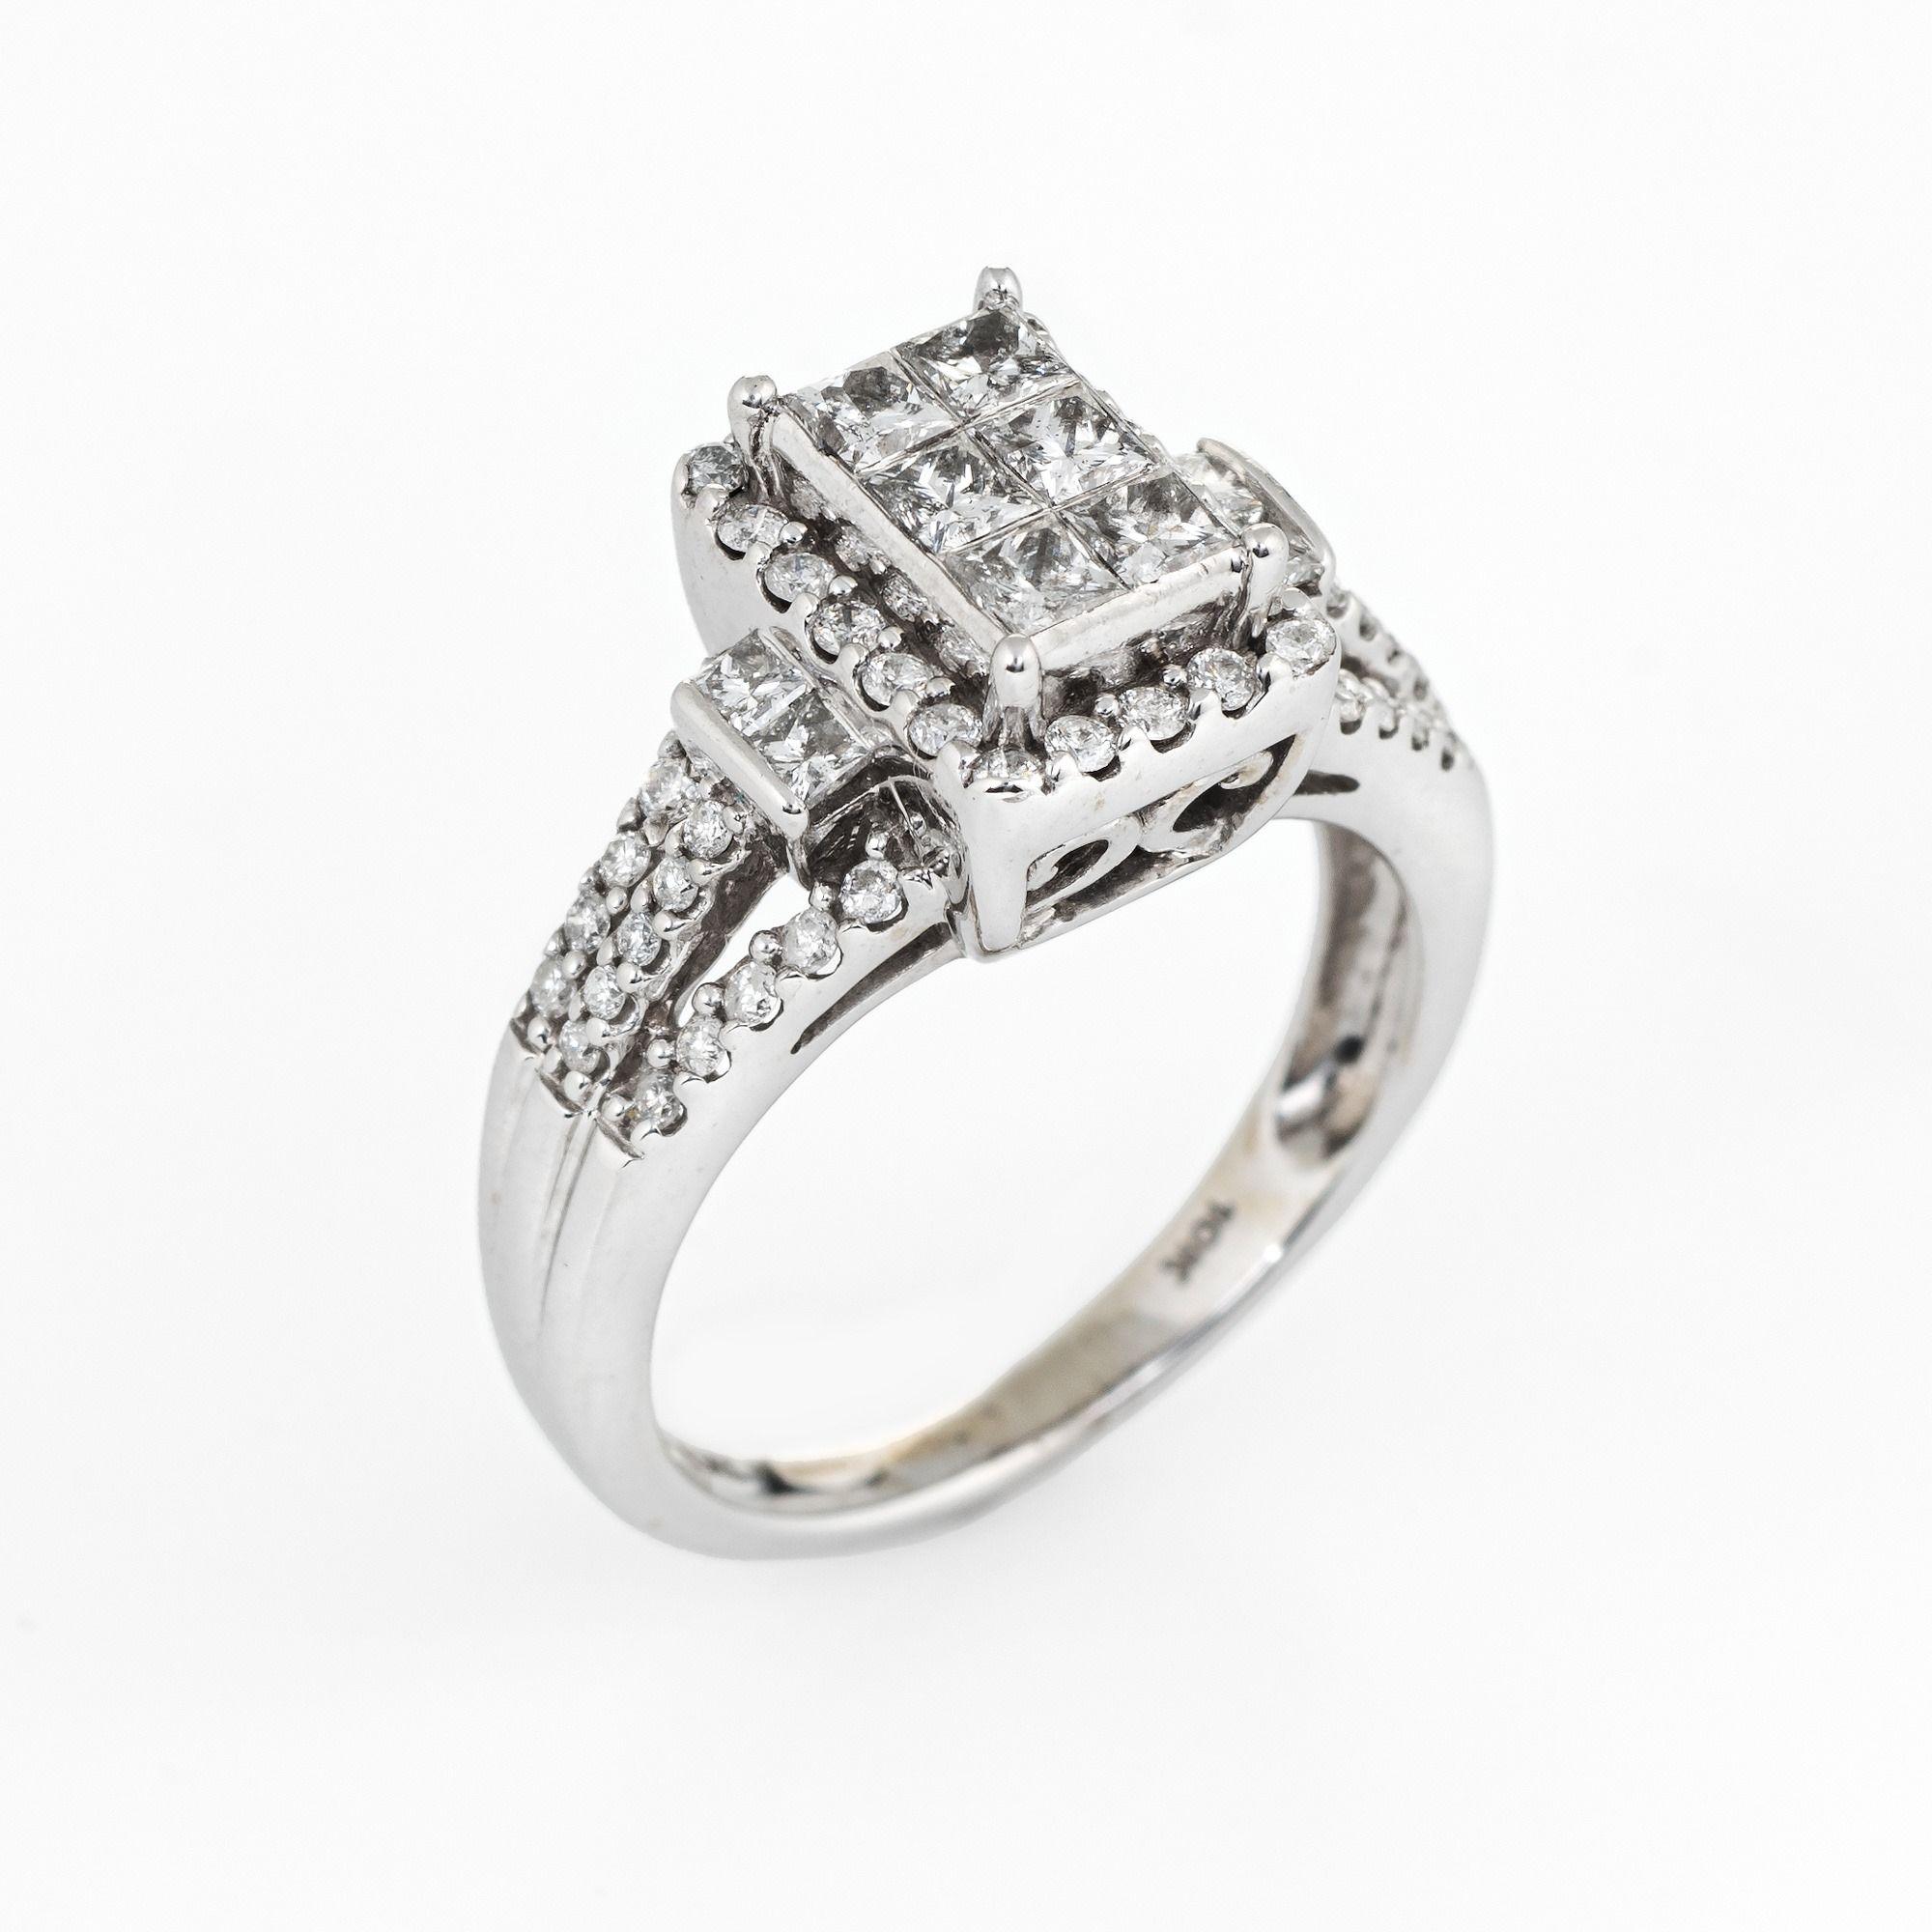 Diamond Cluster Ring Square Estate 10 Karat White Gold Fine Jewelry Illusion Set Sz 6 Diamond Cluster Ring Fine Jewelry Jewelry